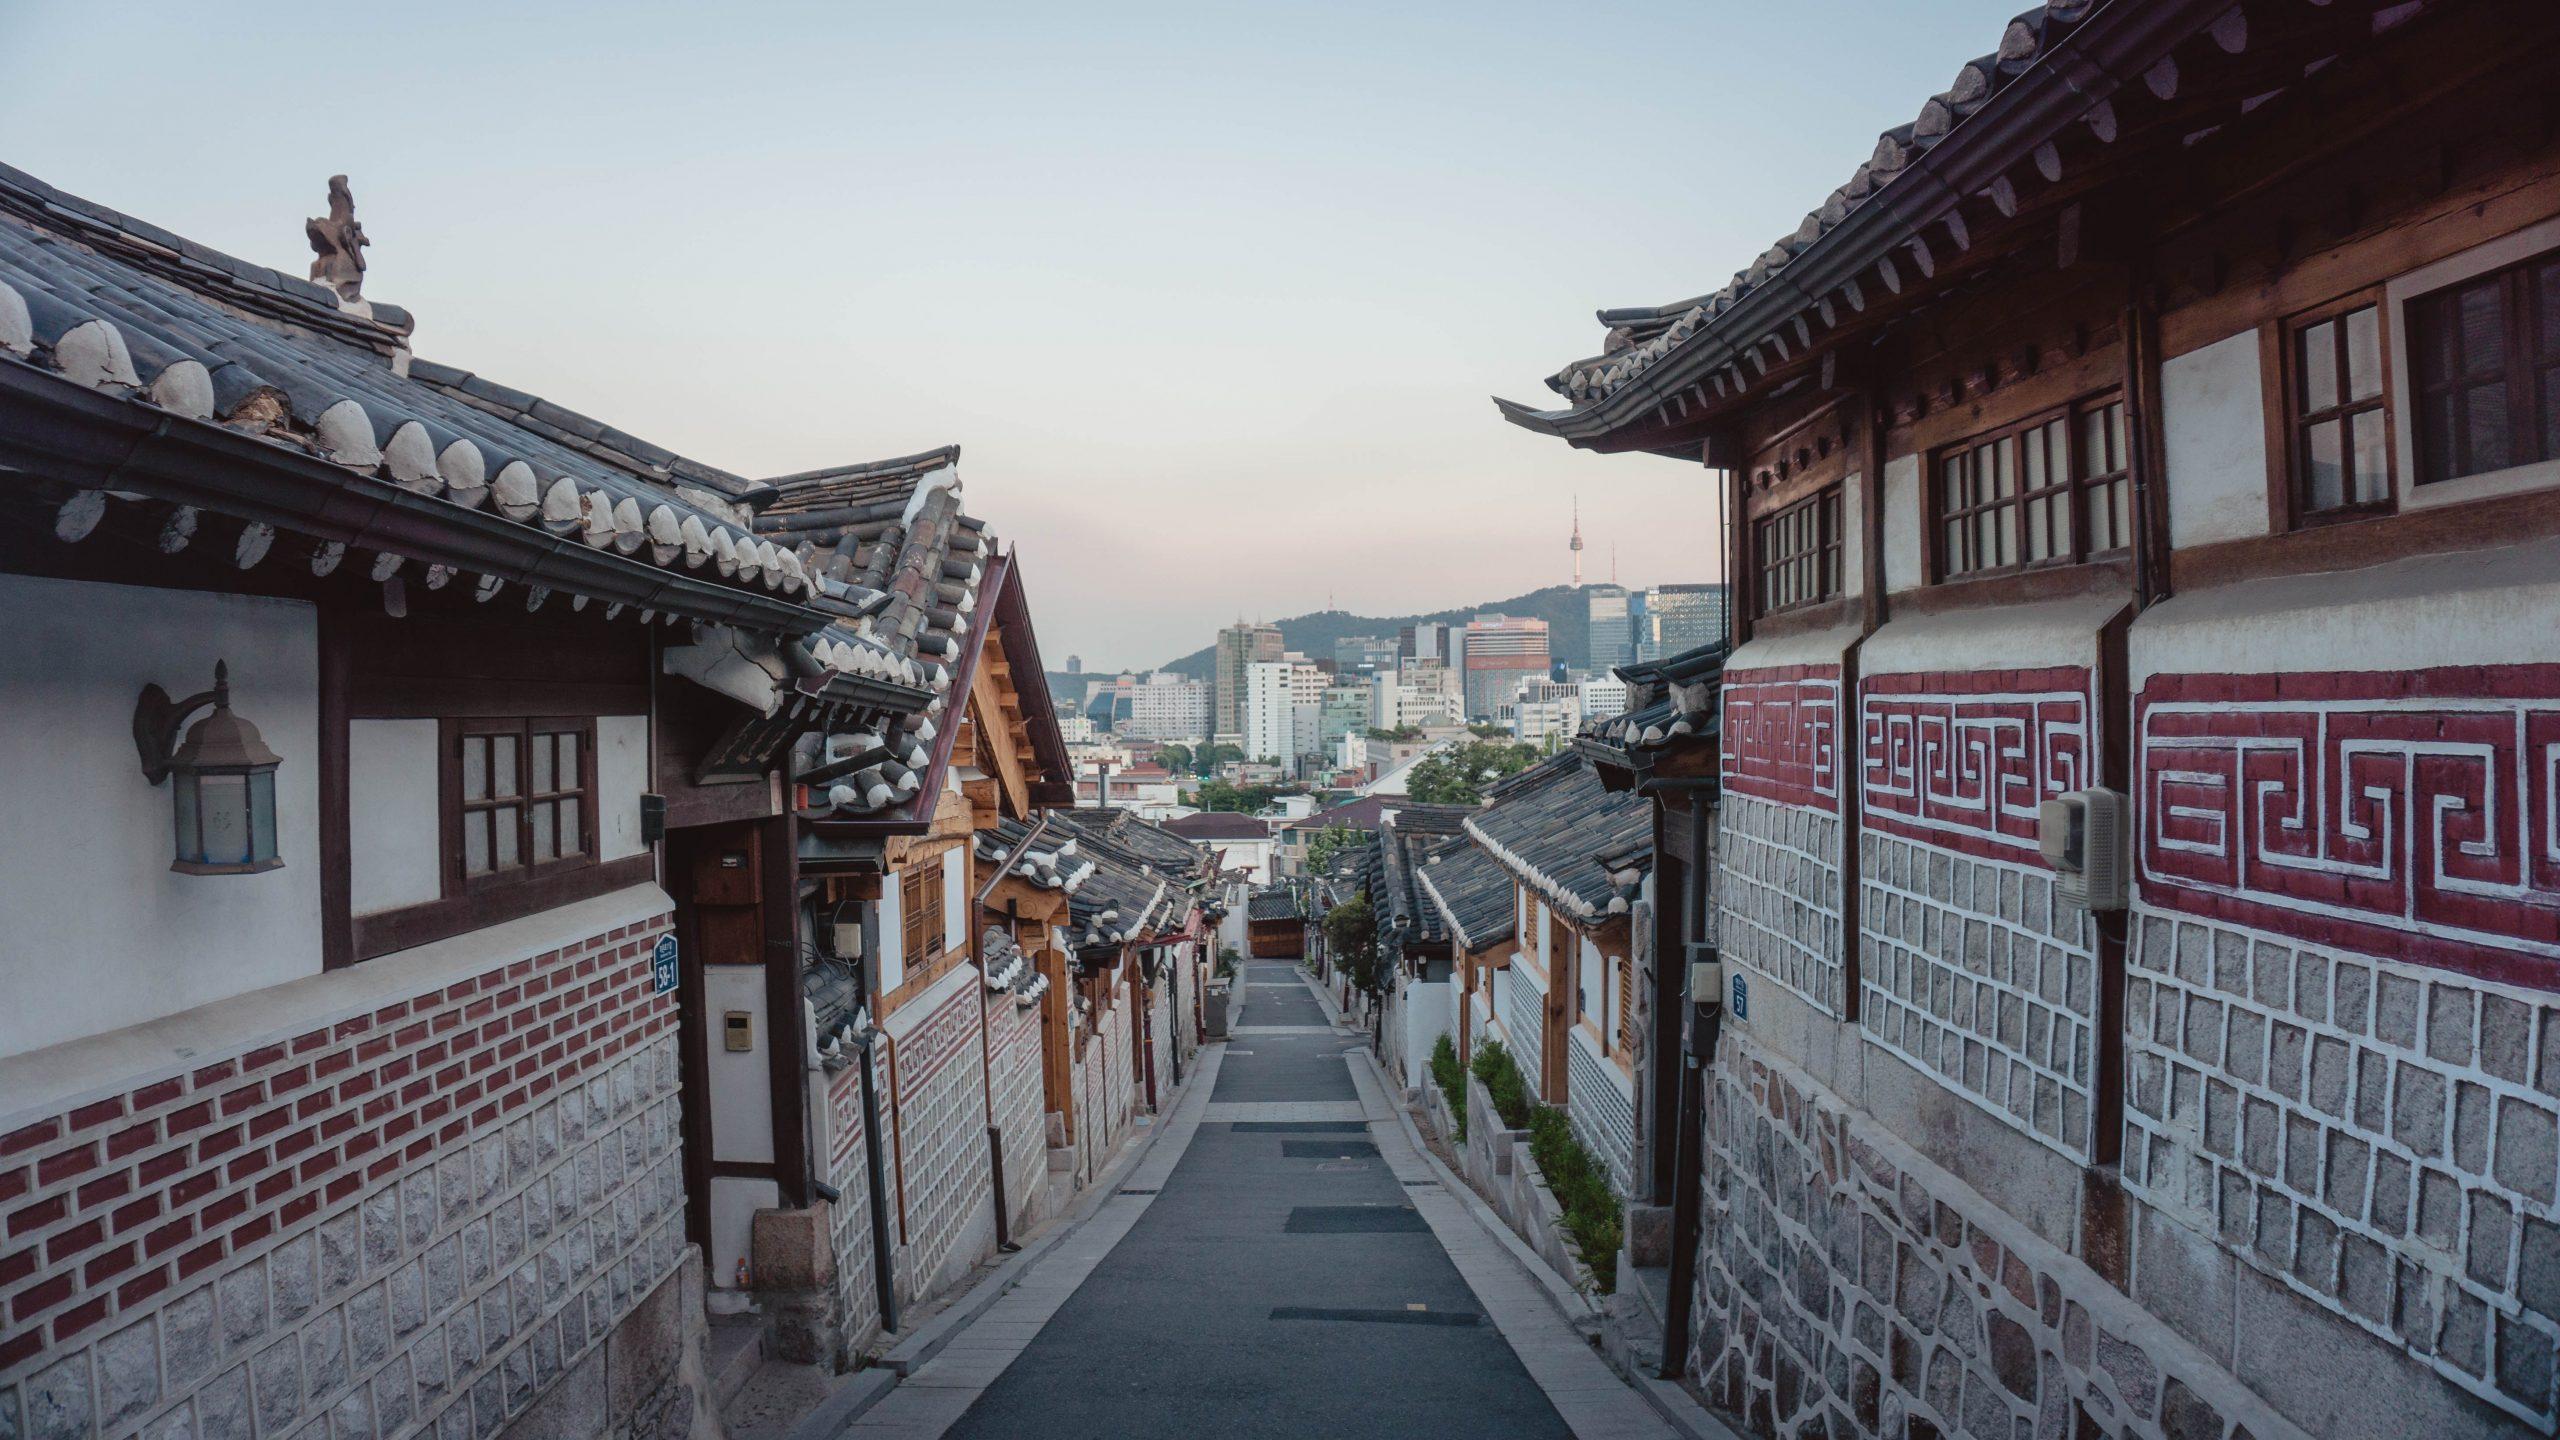 An image of Seoul